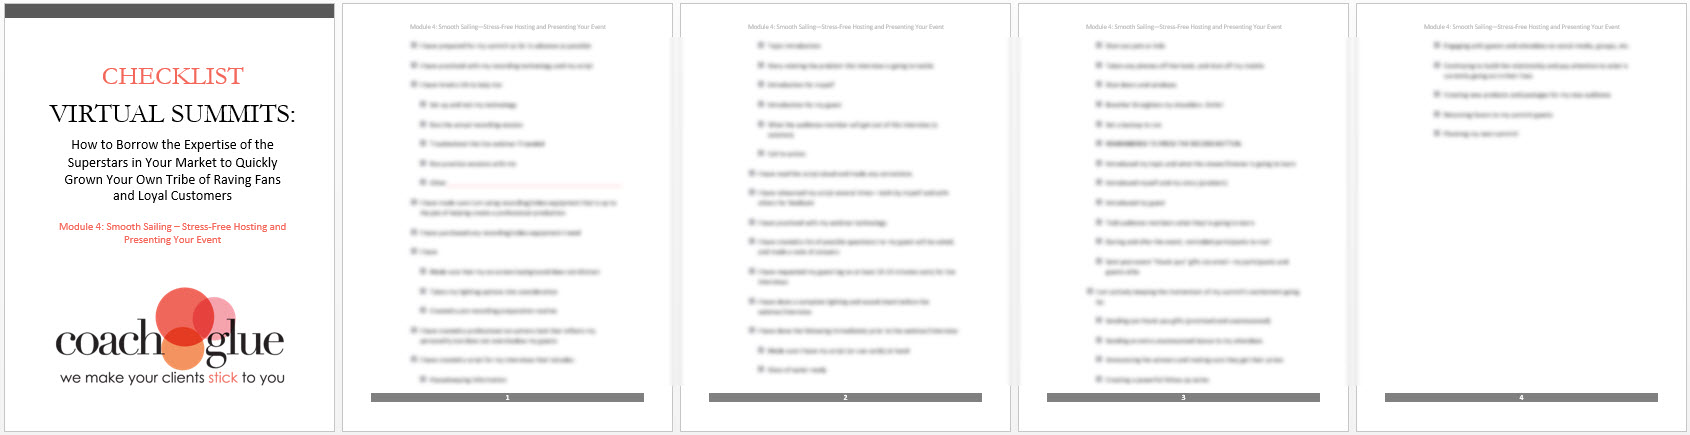 module 4 checklist